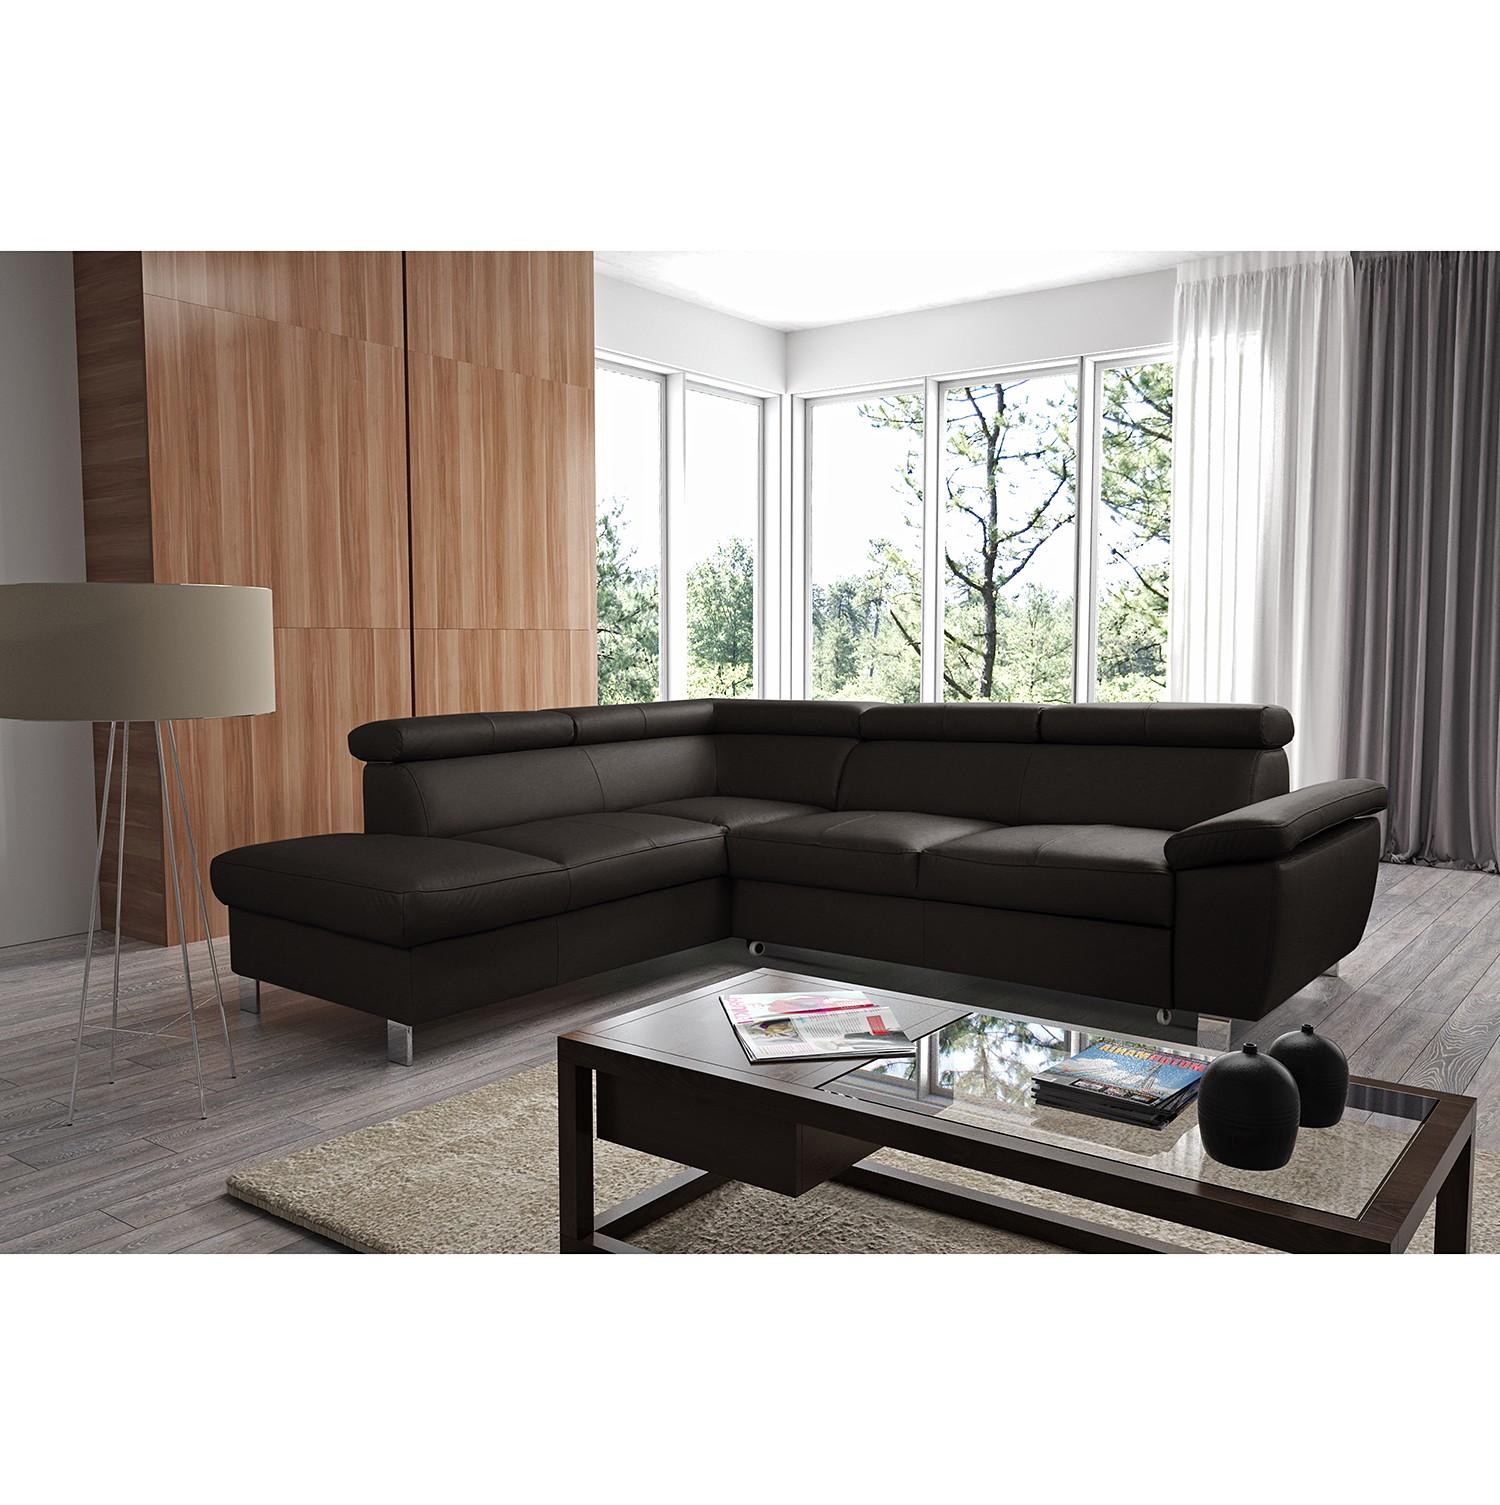 Canapé d'angle Waal I